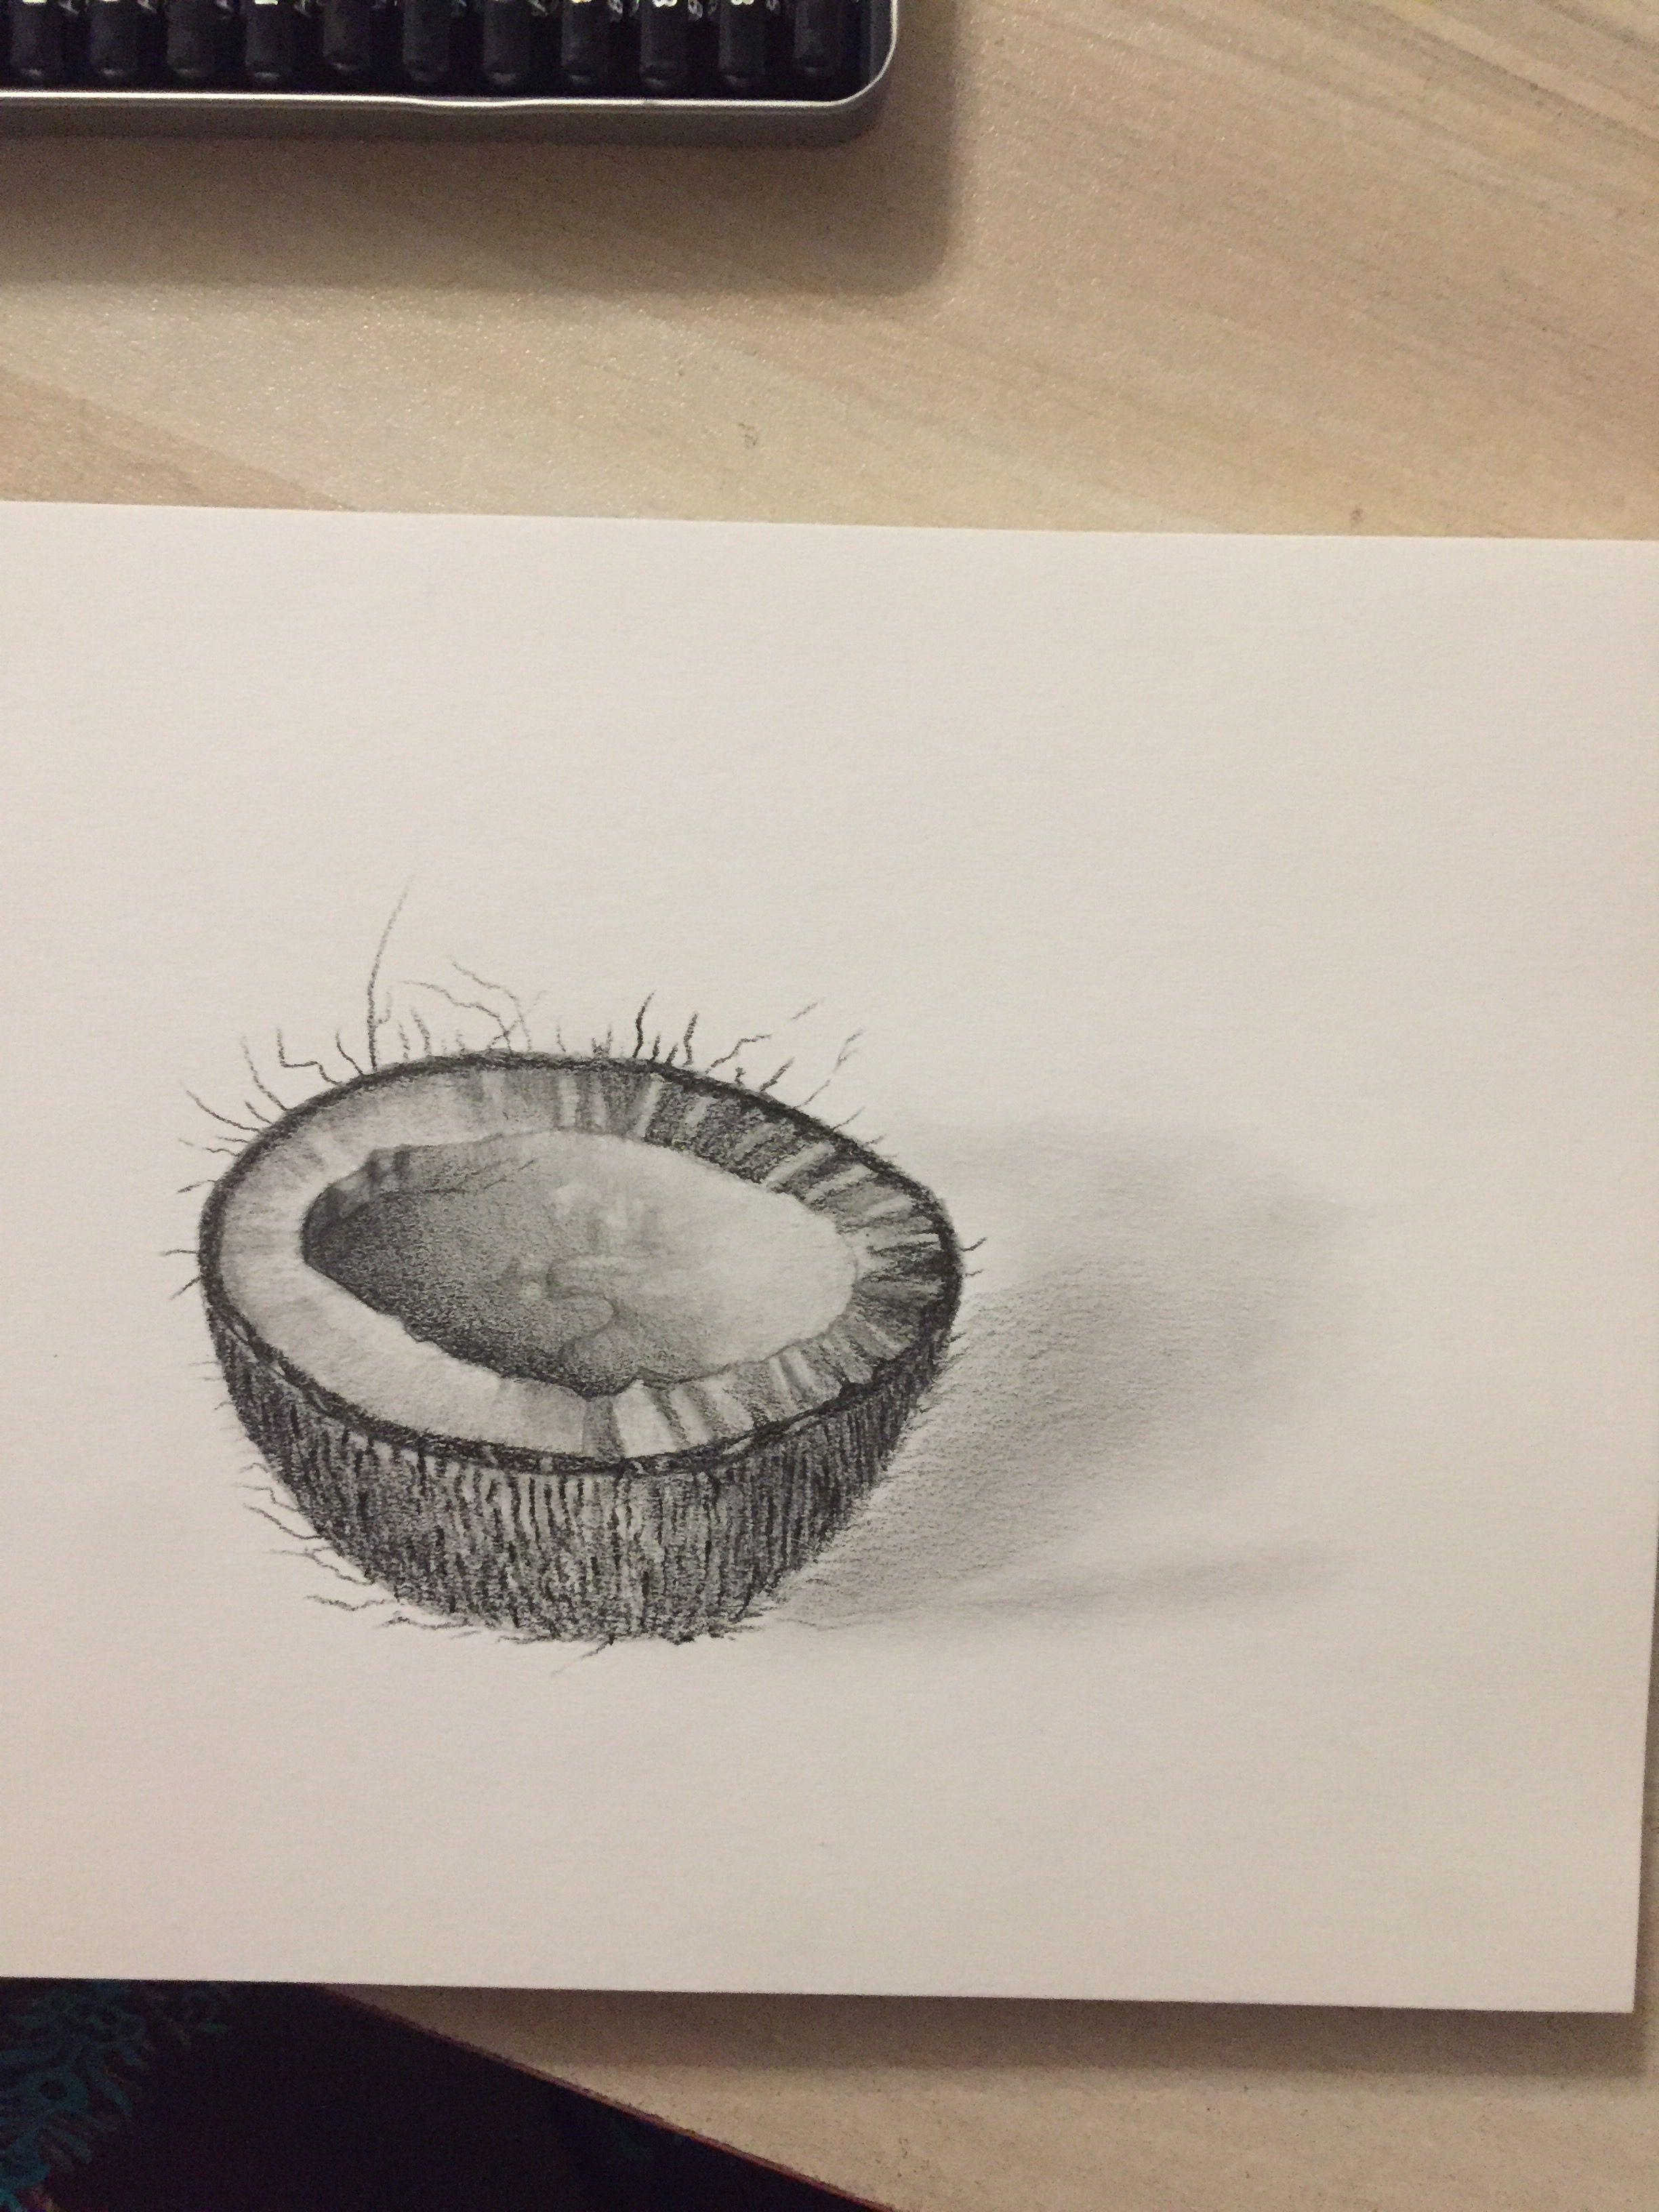 Pencil shading   Drawings, Pencil shading, Art drawings